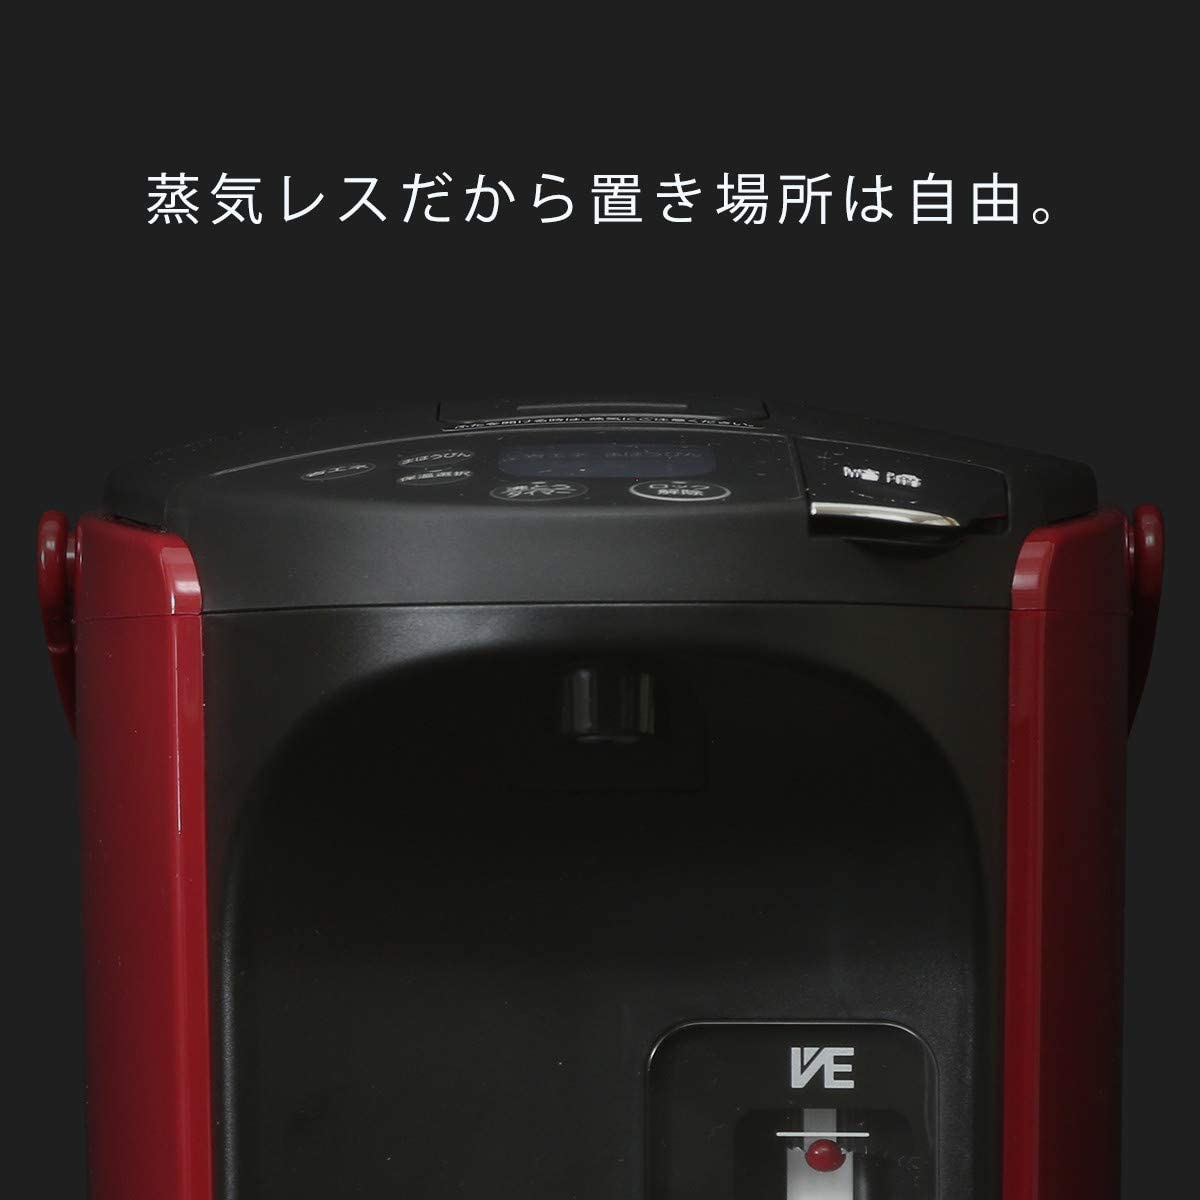 TIGER(タイガー)蒸気レスVE電気まほうびん PIP-A220の商品画像4